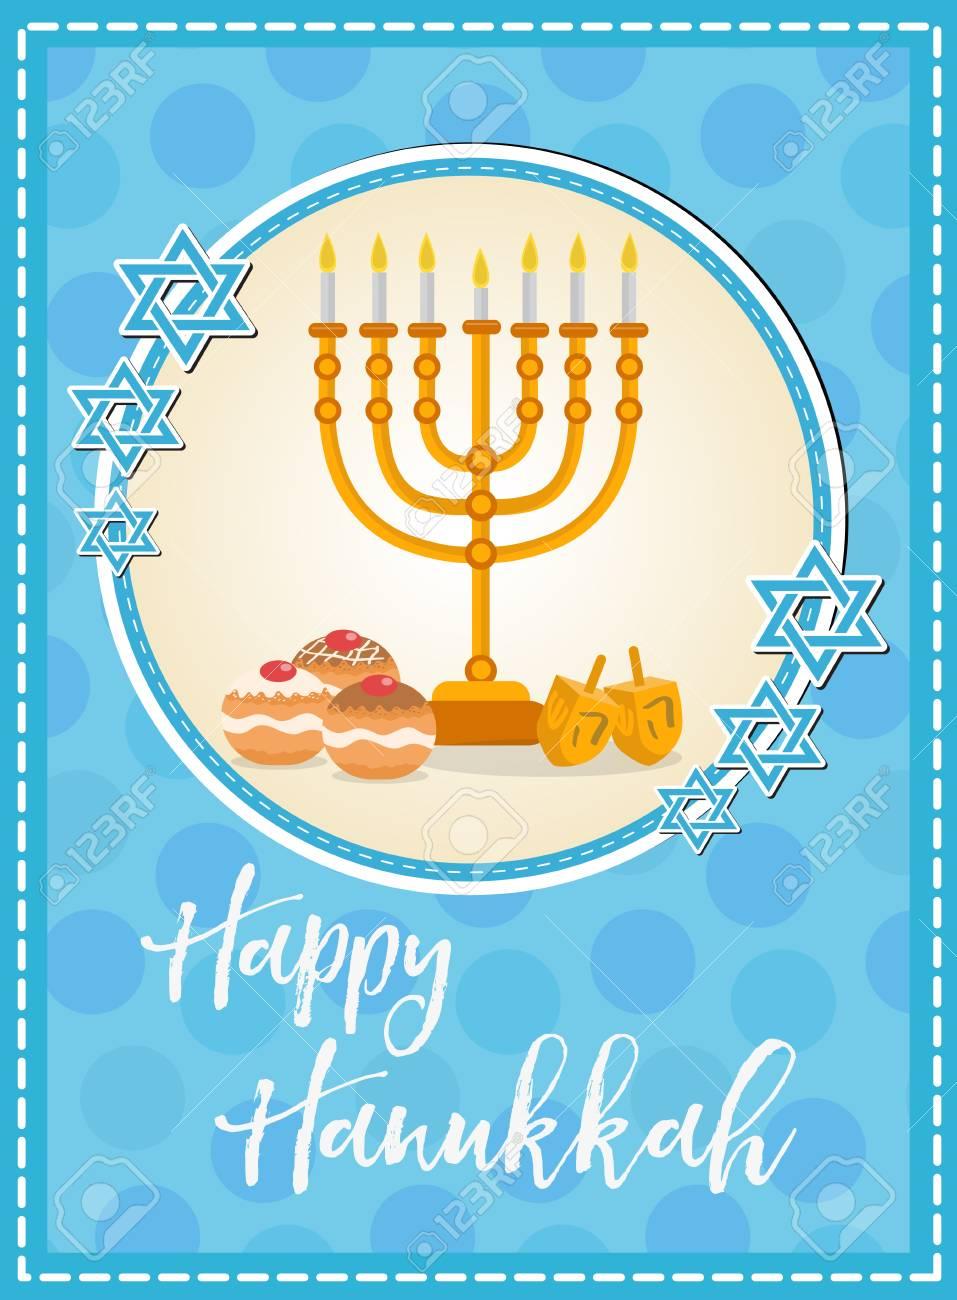 Happy hanukkah greeting card flyer poster template for your happy hanukkah greeting card flyer poster template for your invitation design with m4hsunfo